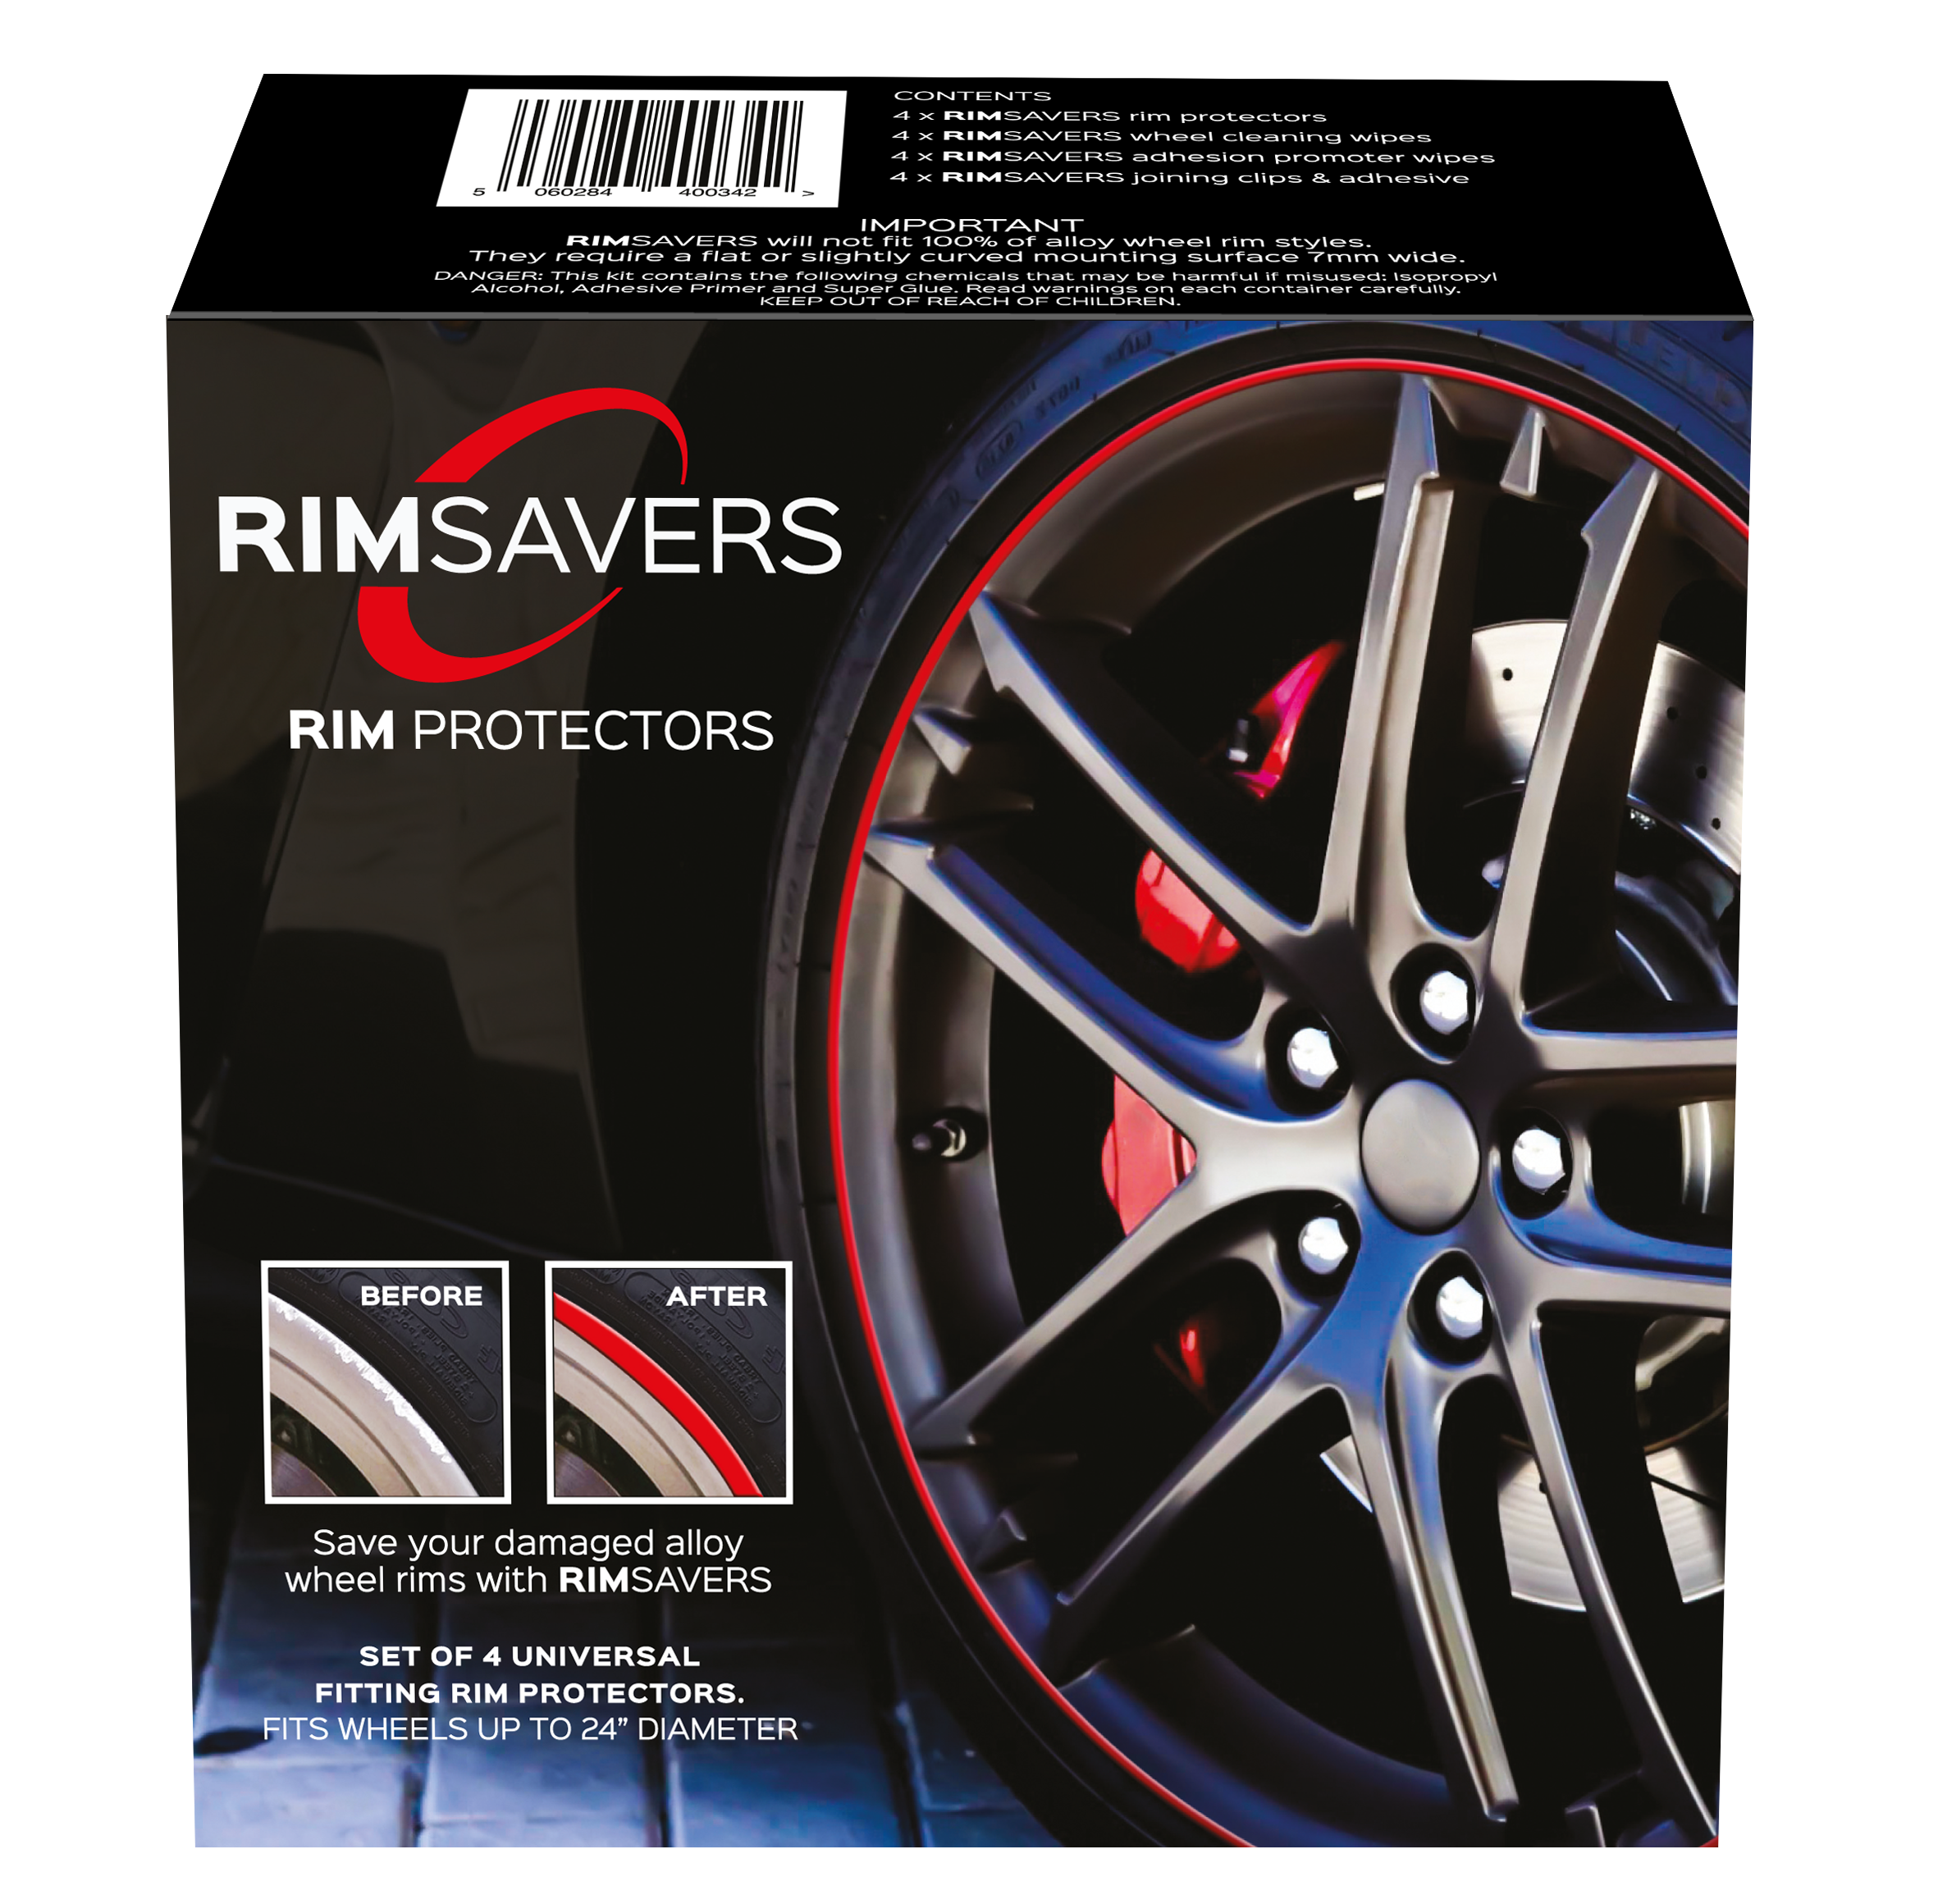 7d1abe6133 RimSavers - Maximum Protection For Your Rims